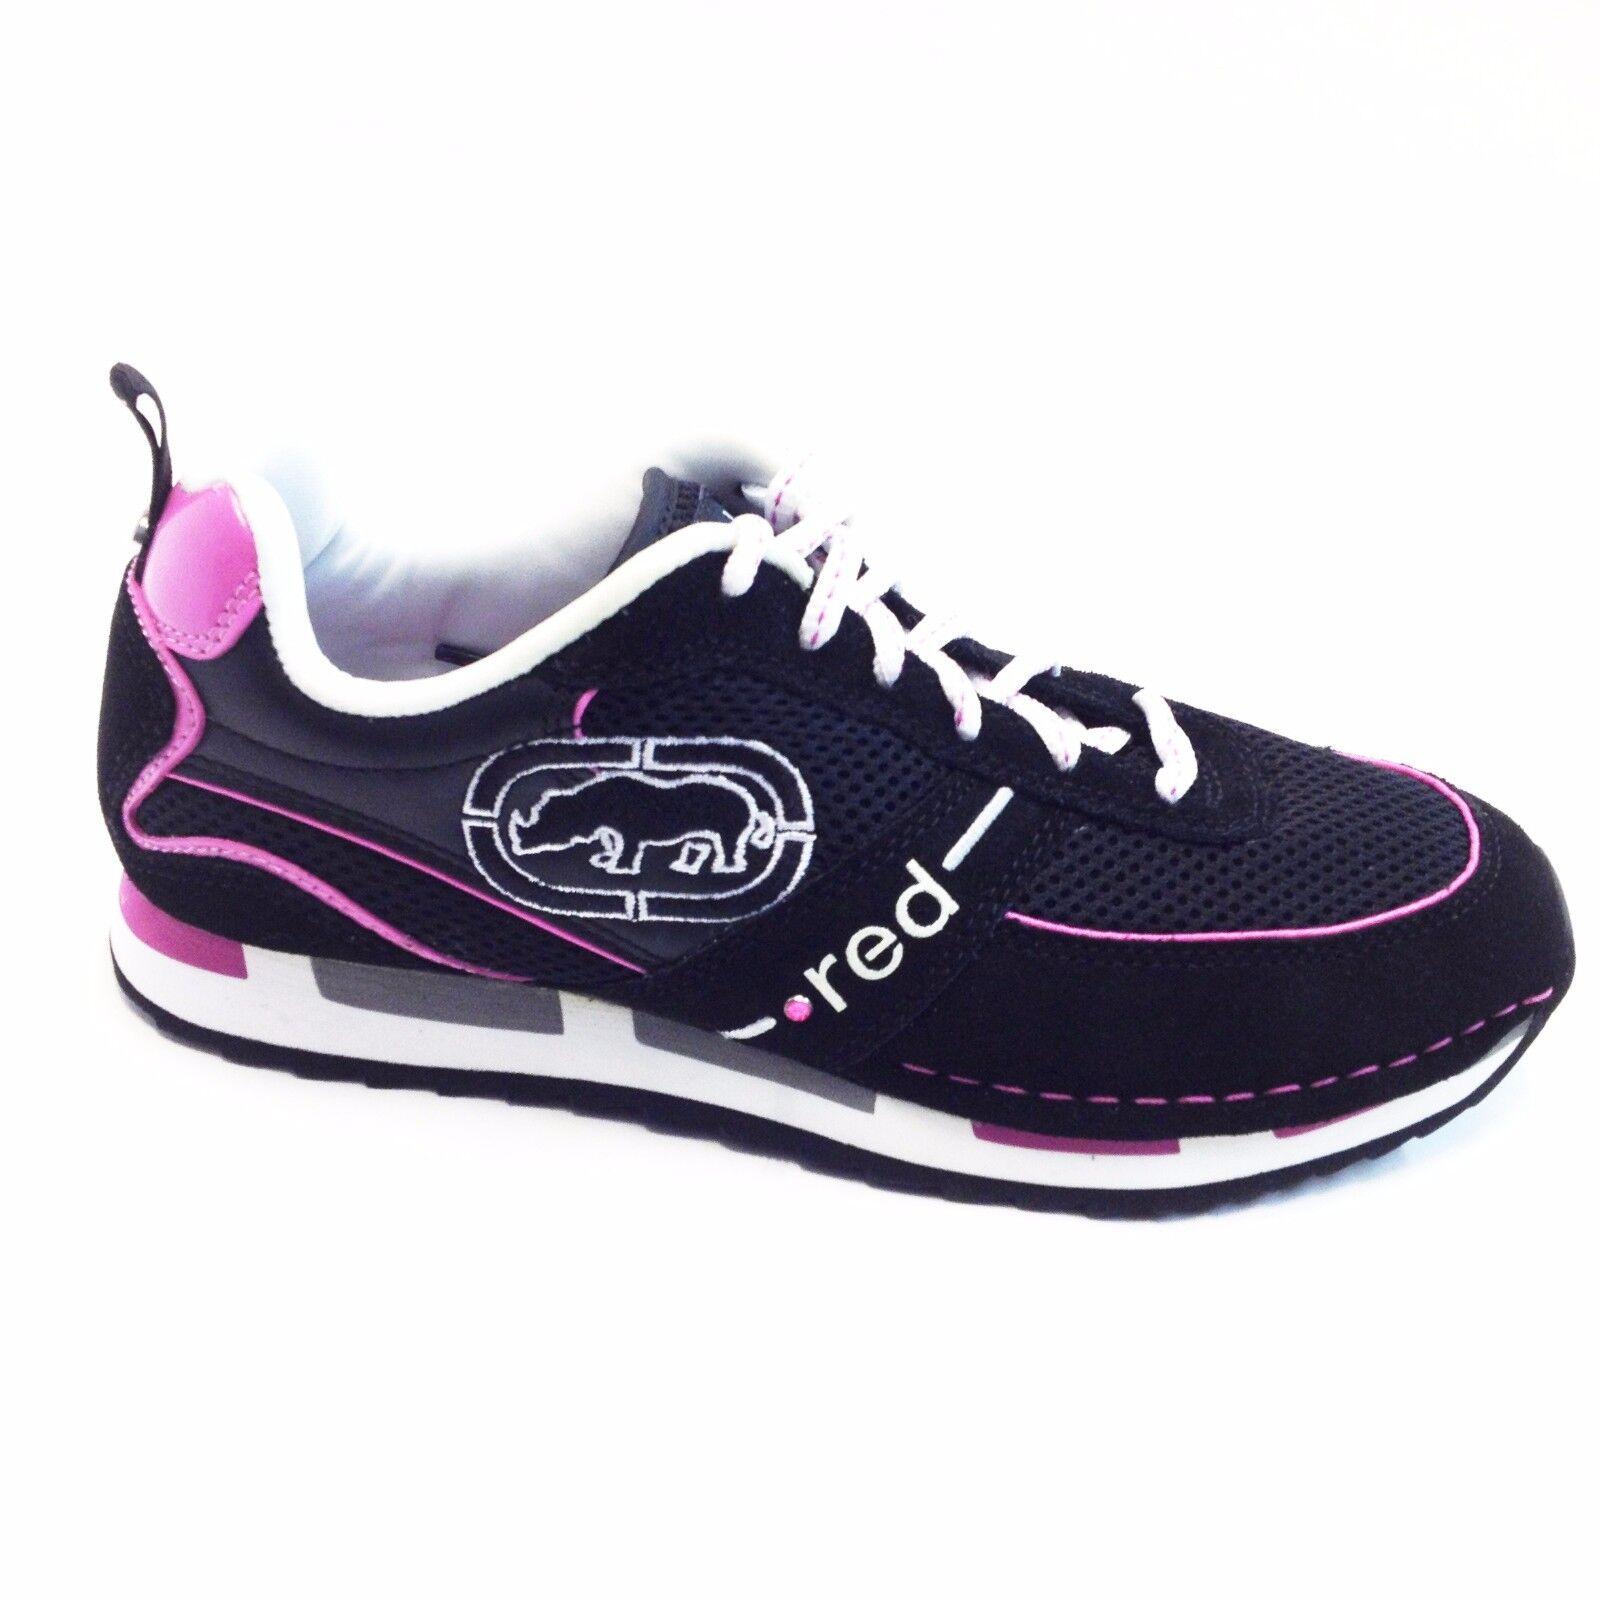 Damens Ecko ROT Schuhes ATOMIX /BKPK Style#26035 Größe 6.5-8